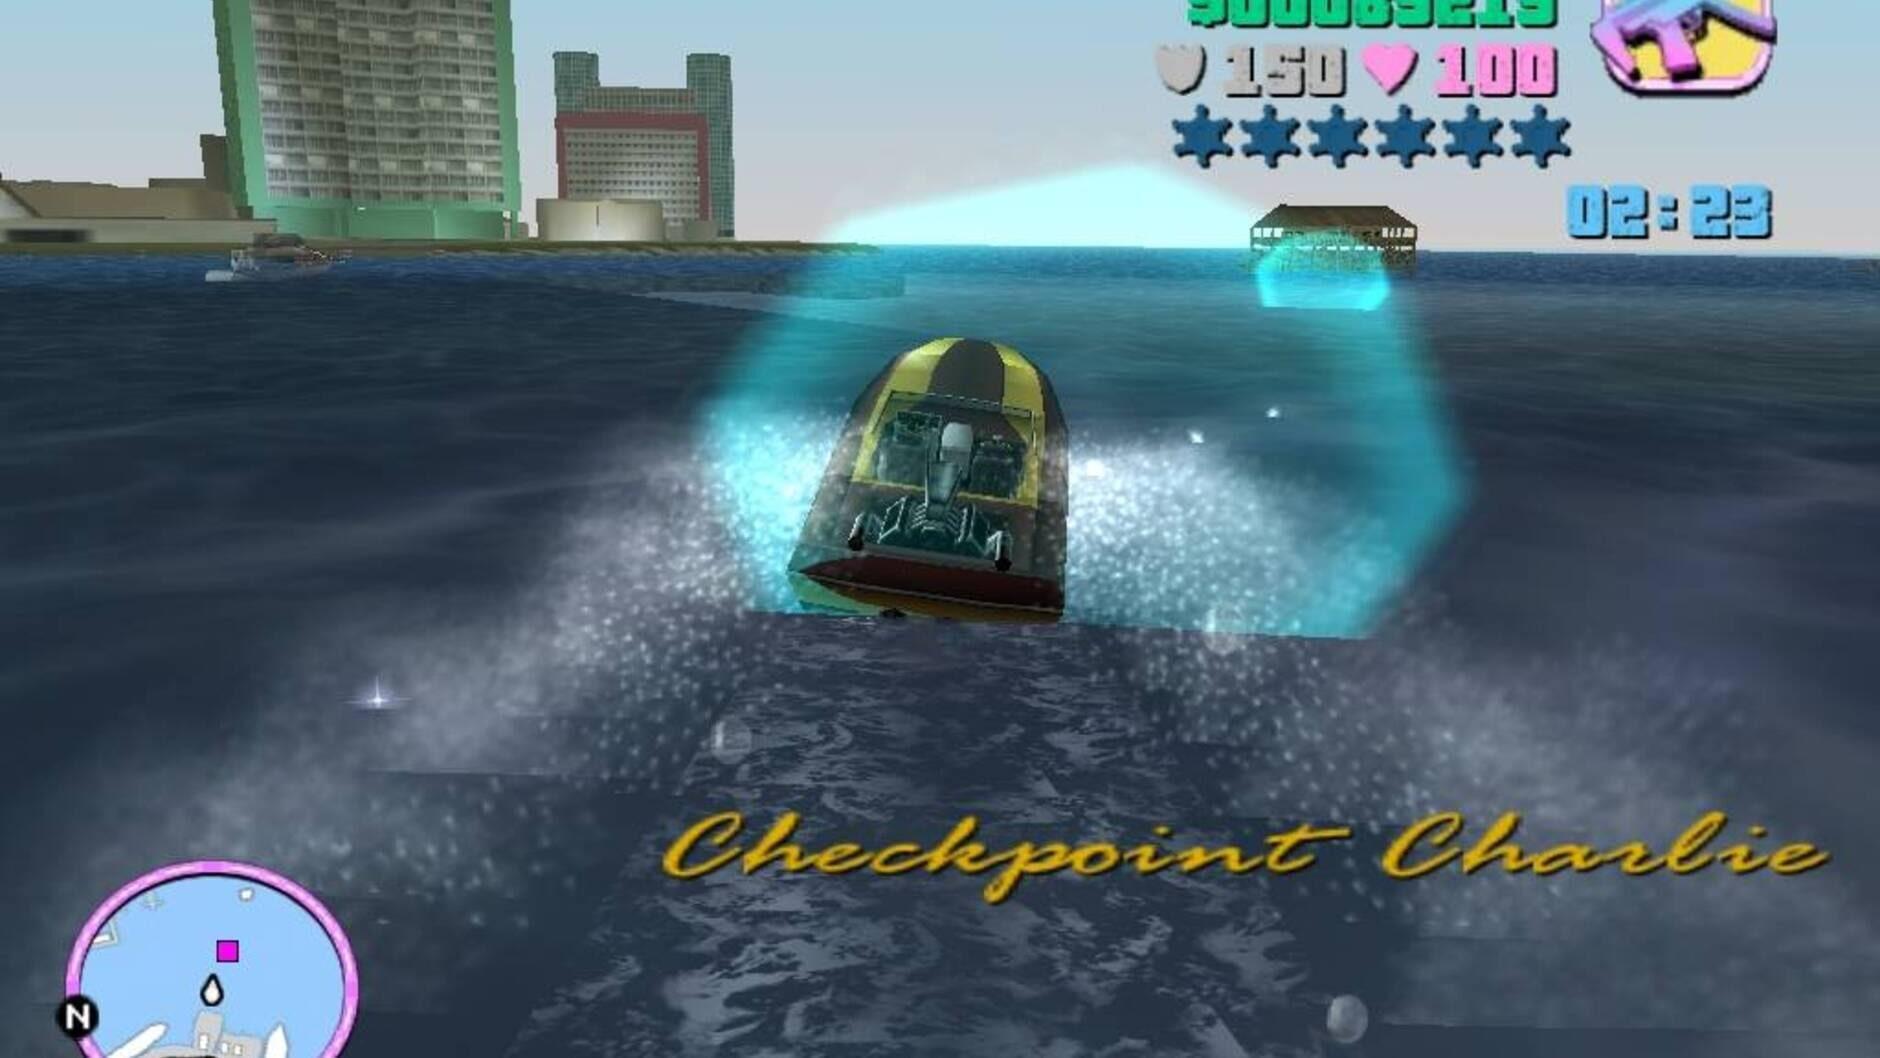 Grand Theft Auto: Vice City - 0